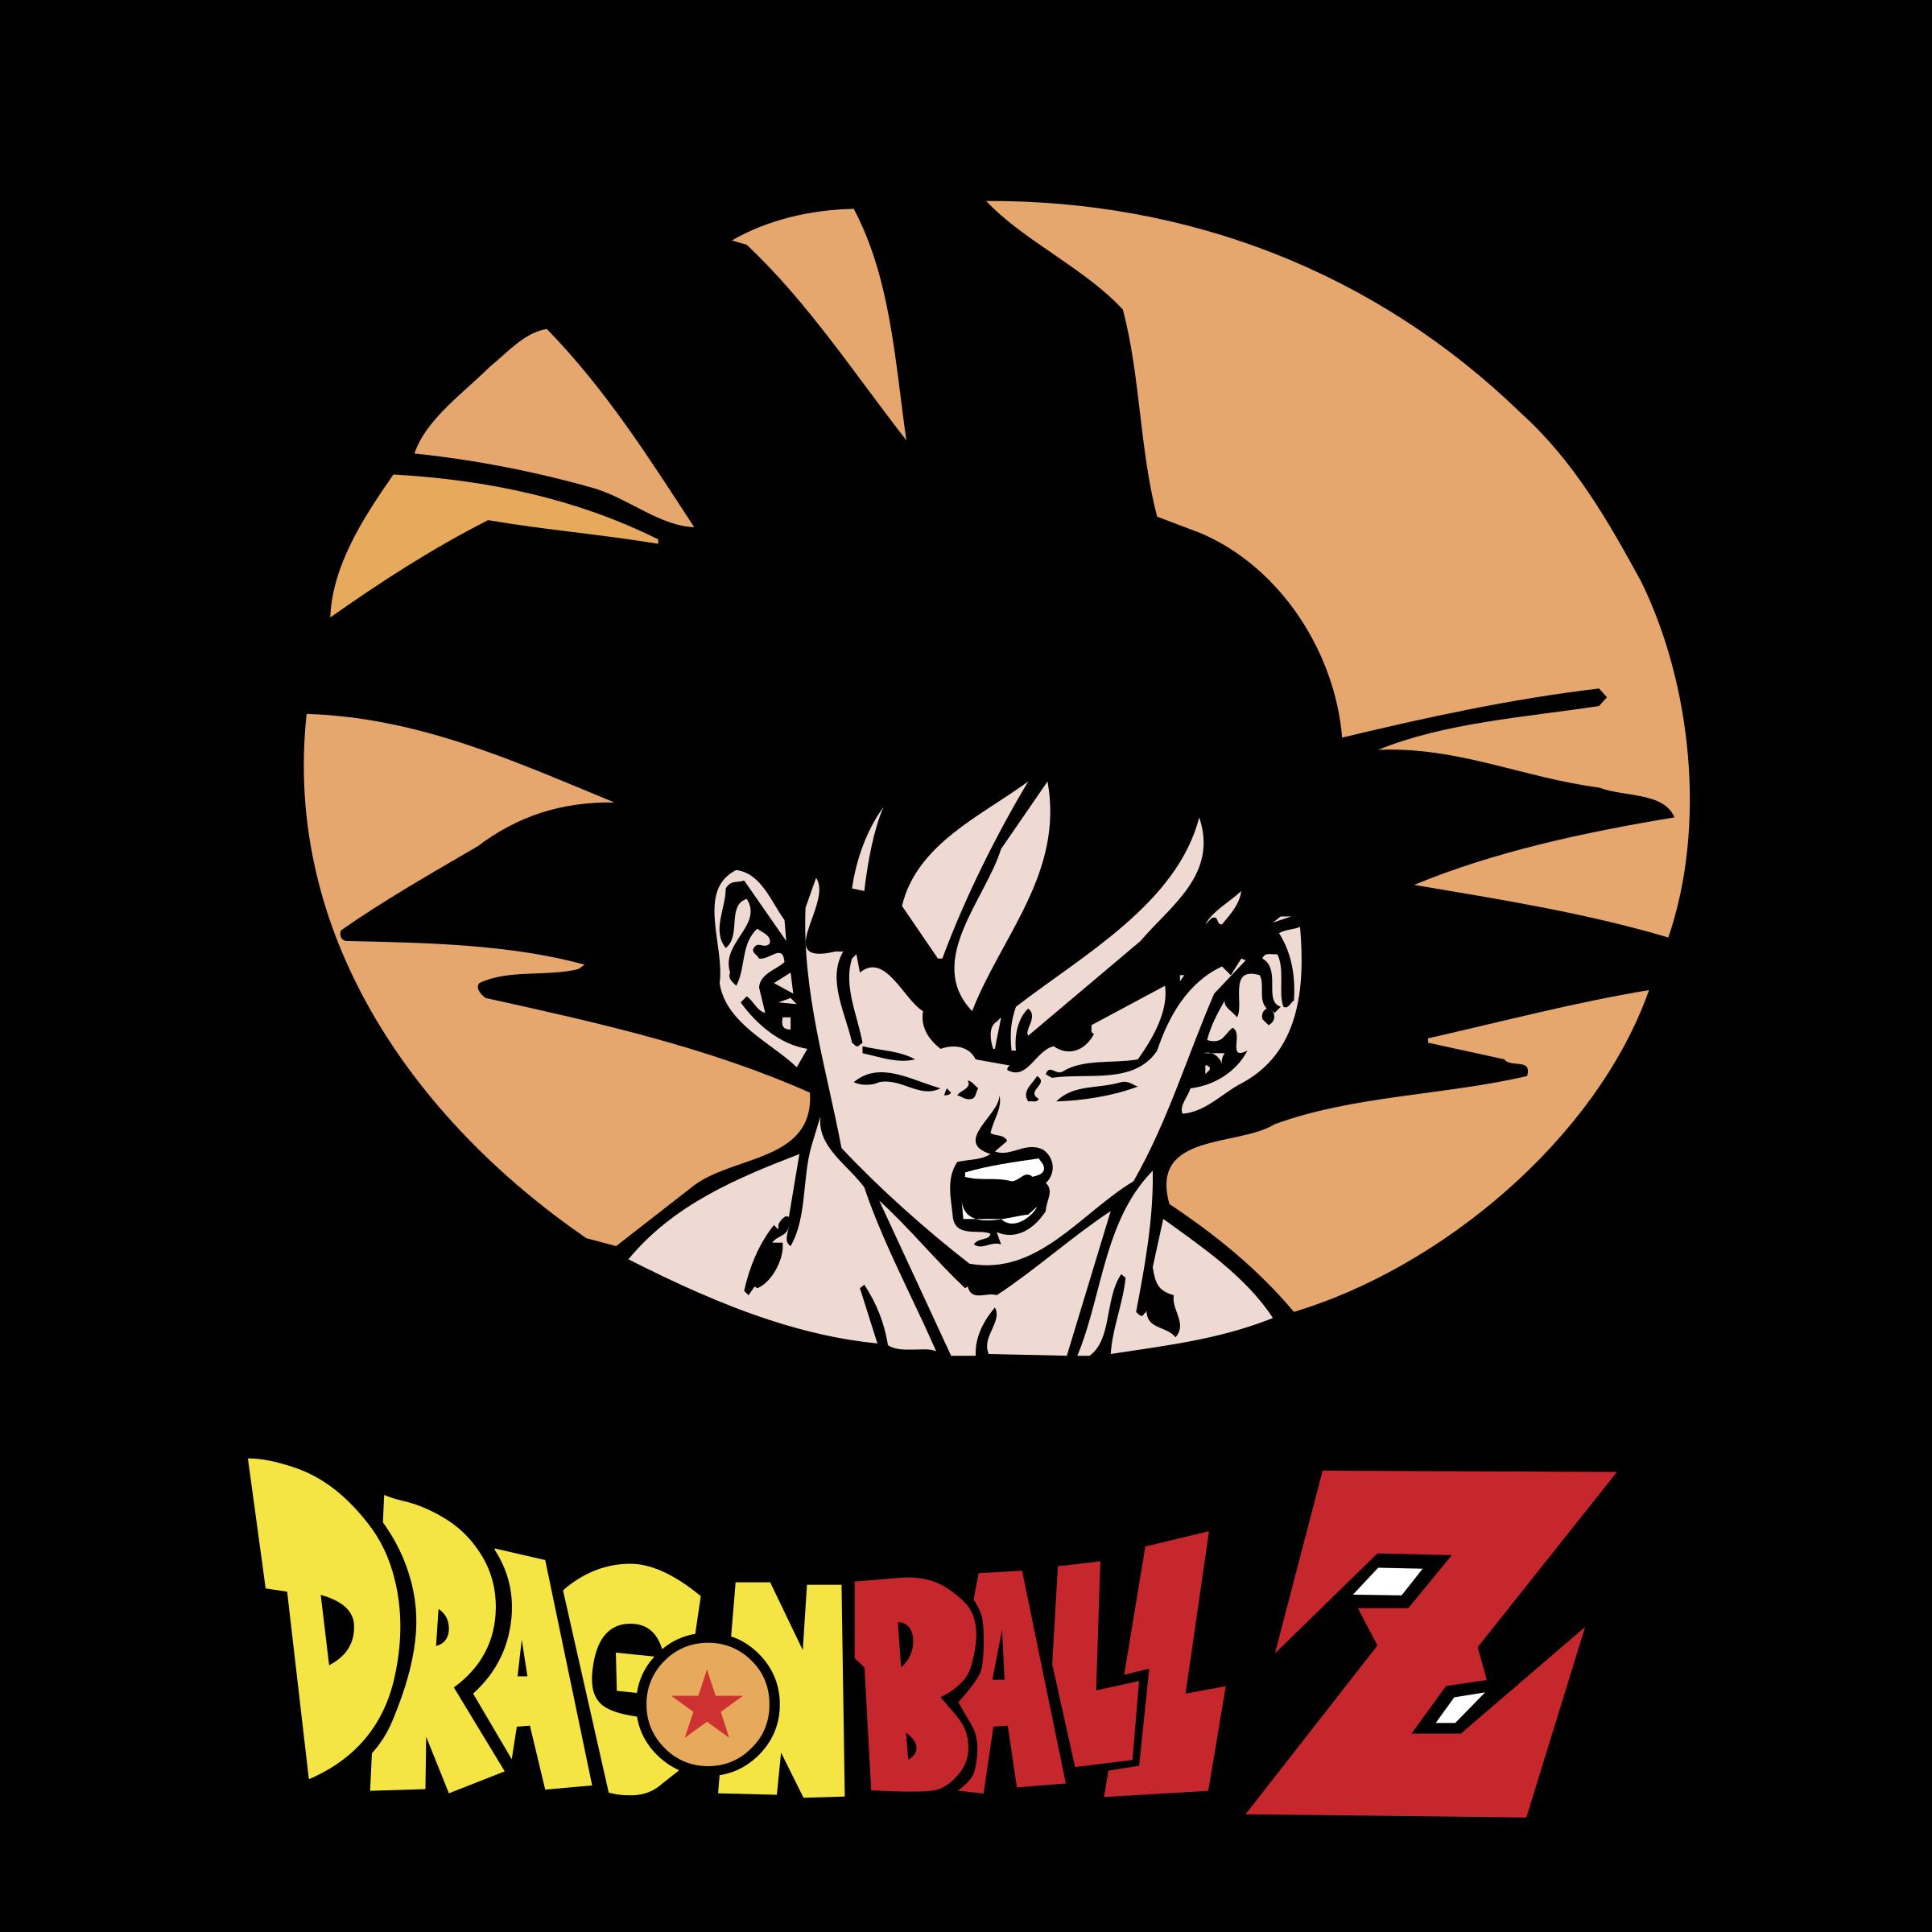 Dragon Ball Z Logo Png Transparent Svg Vector Freebie Supply